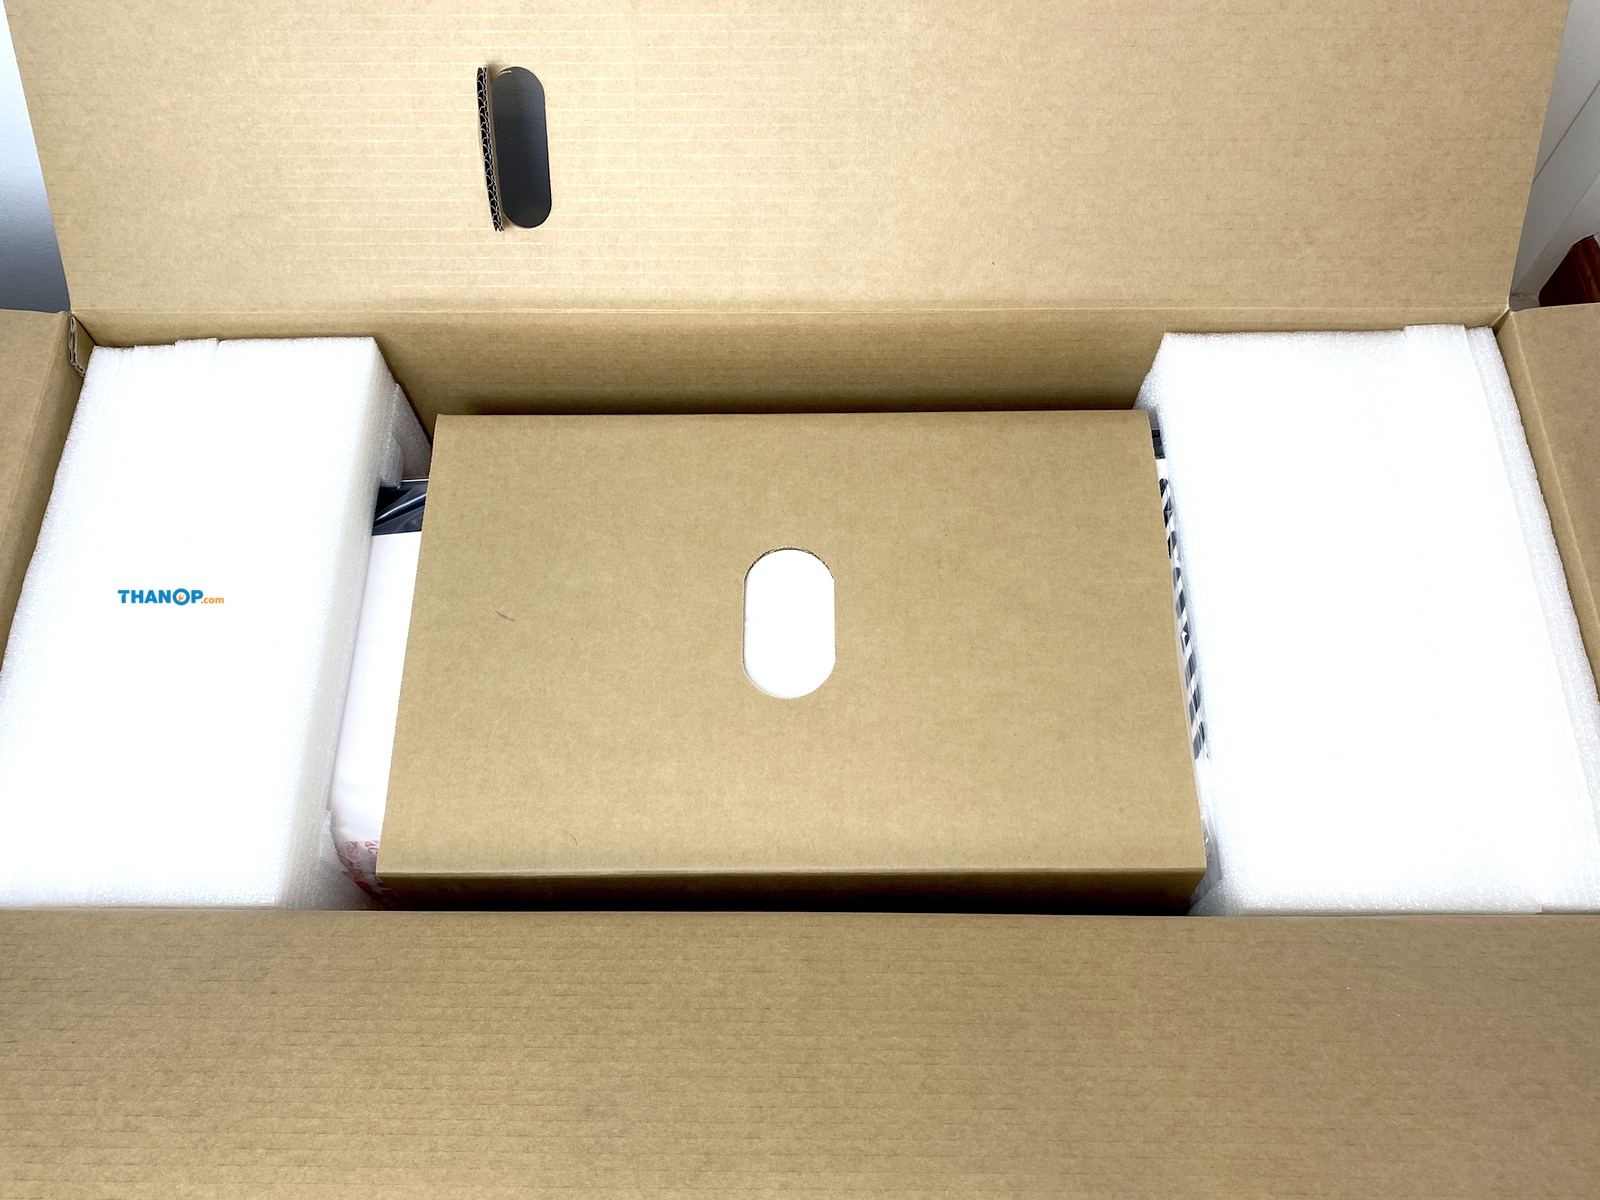 blueair-healthprotect-7770i-box-unpacked